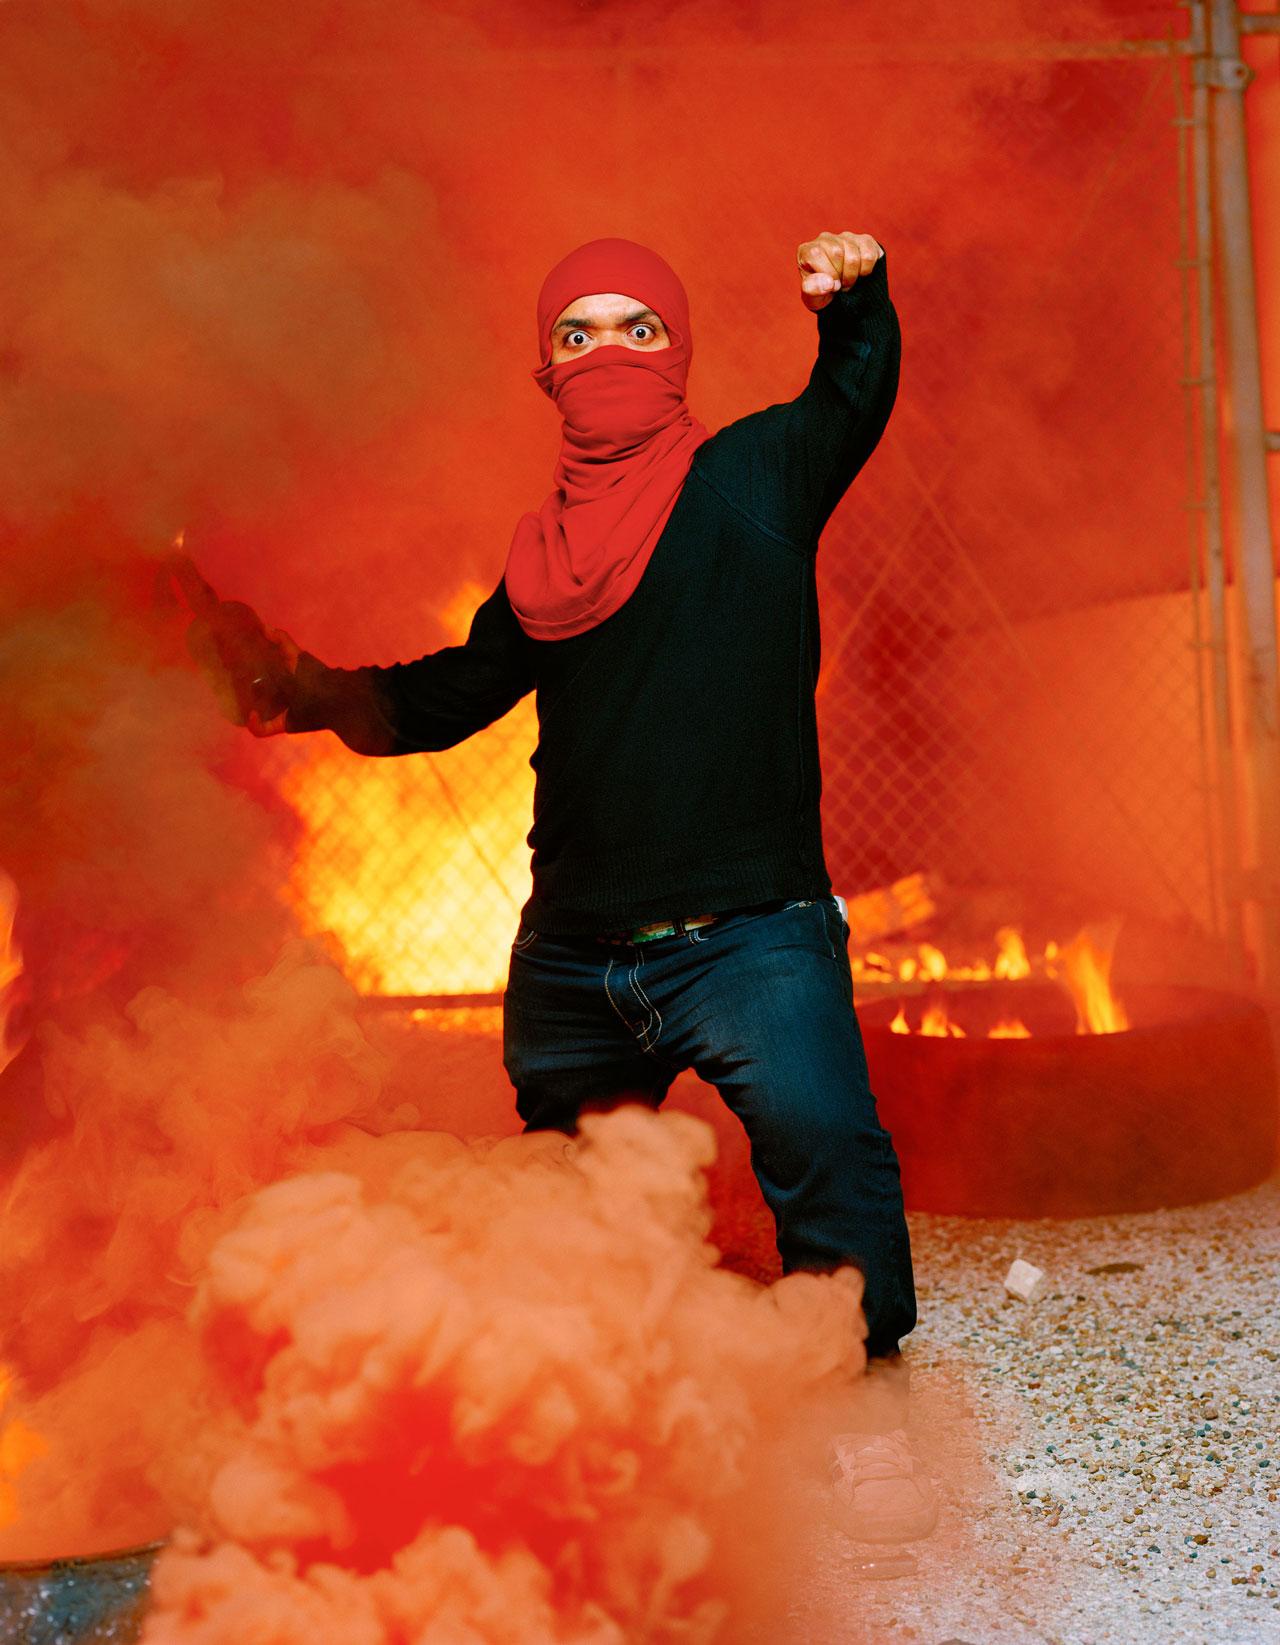 santiago-forero-riot-action-heroes.jpg